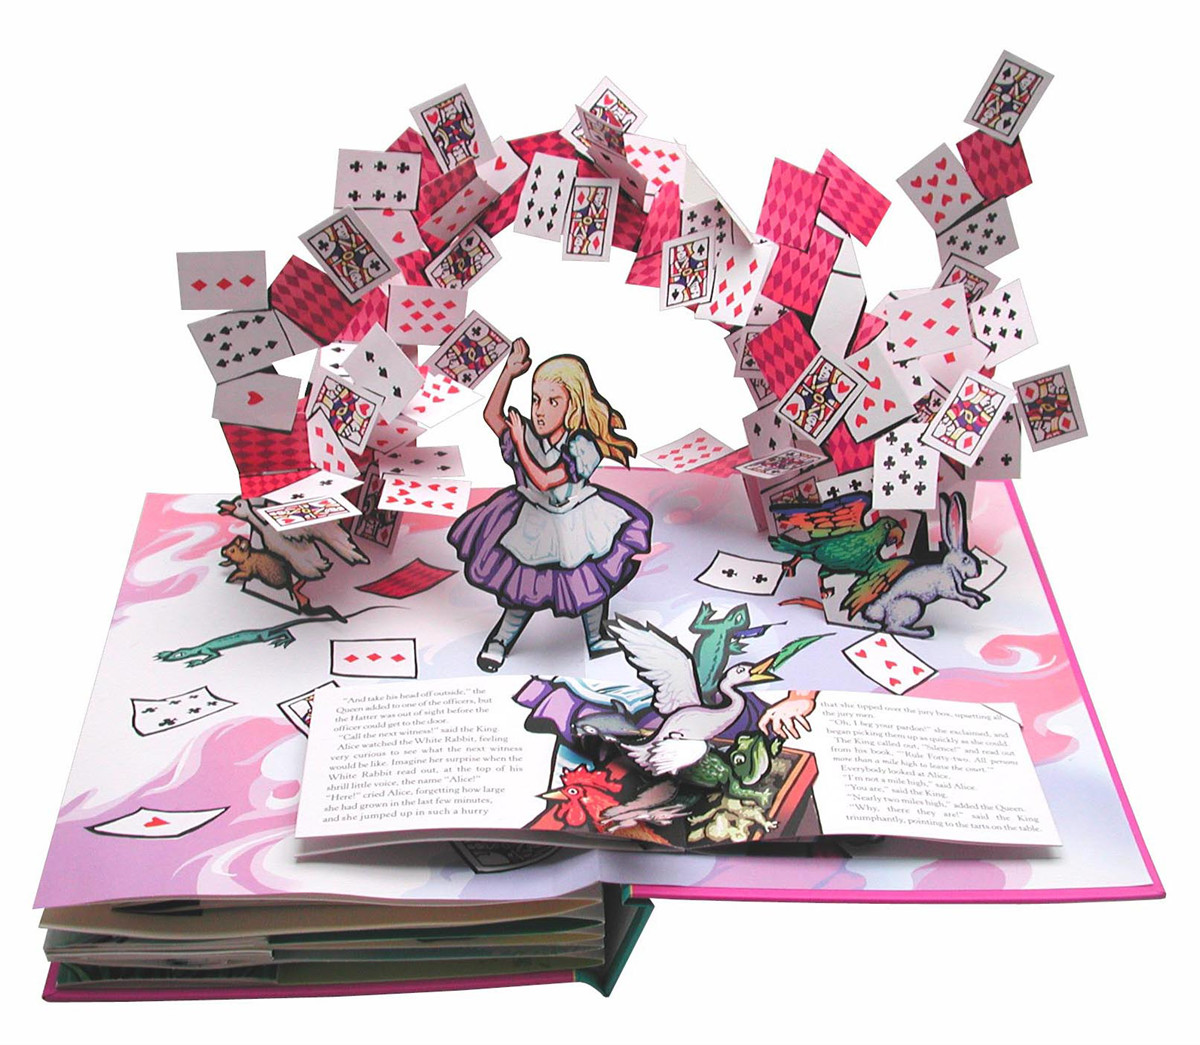 Alices adventures in wonderland 9780689847431.in02